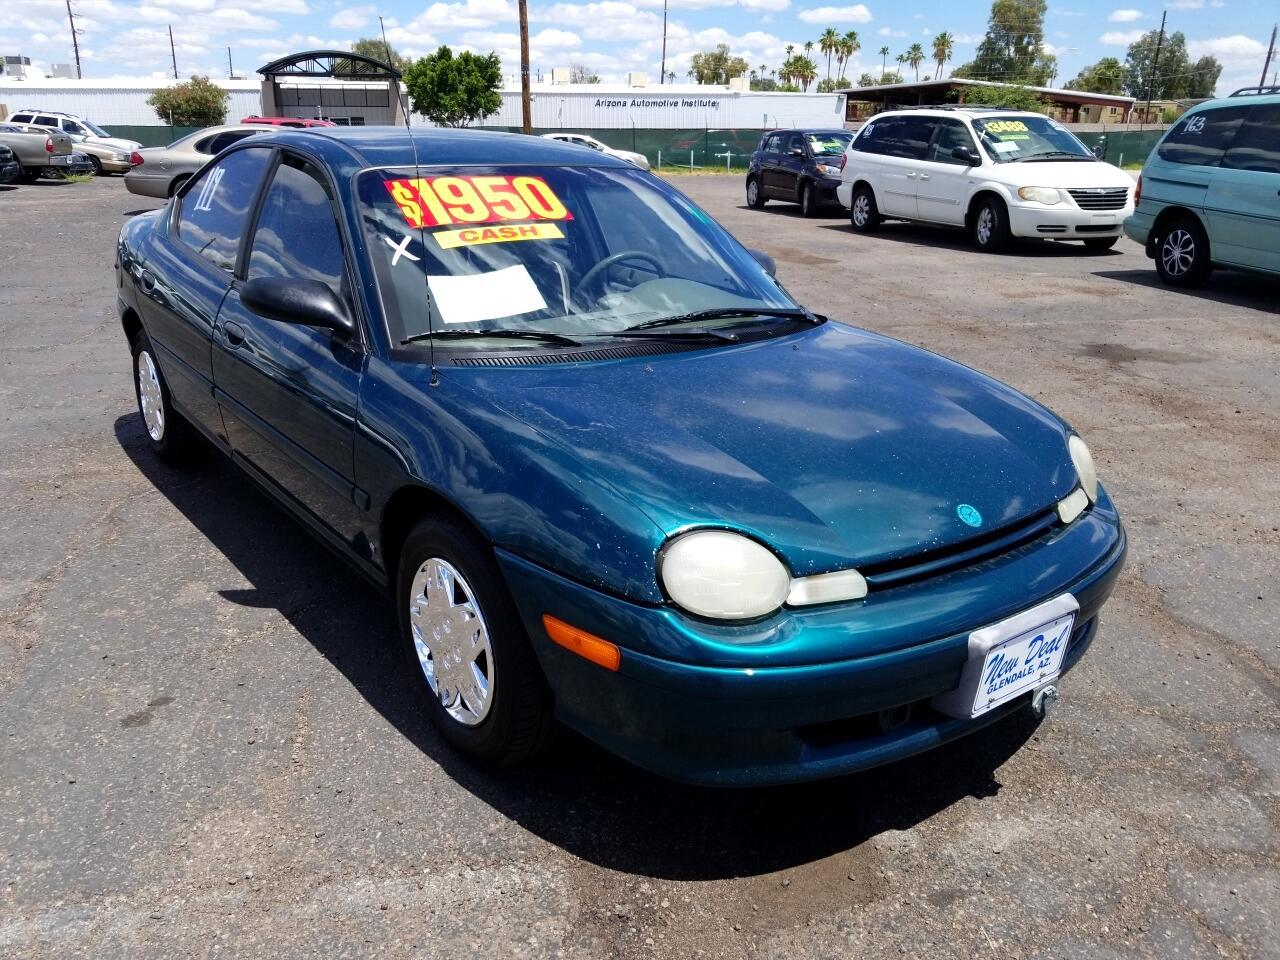 1995 Plymouth Neon Highline sedan